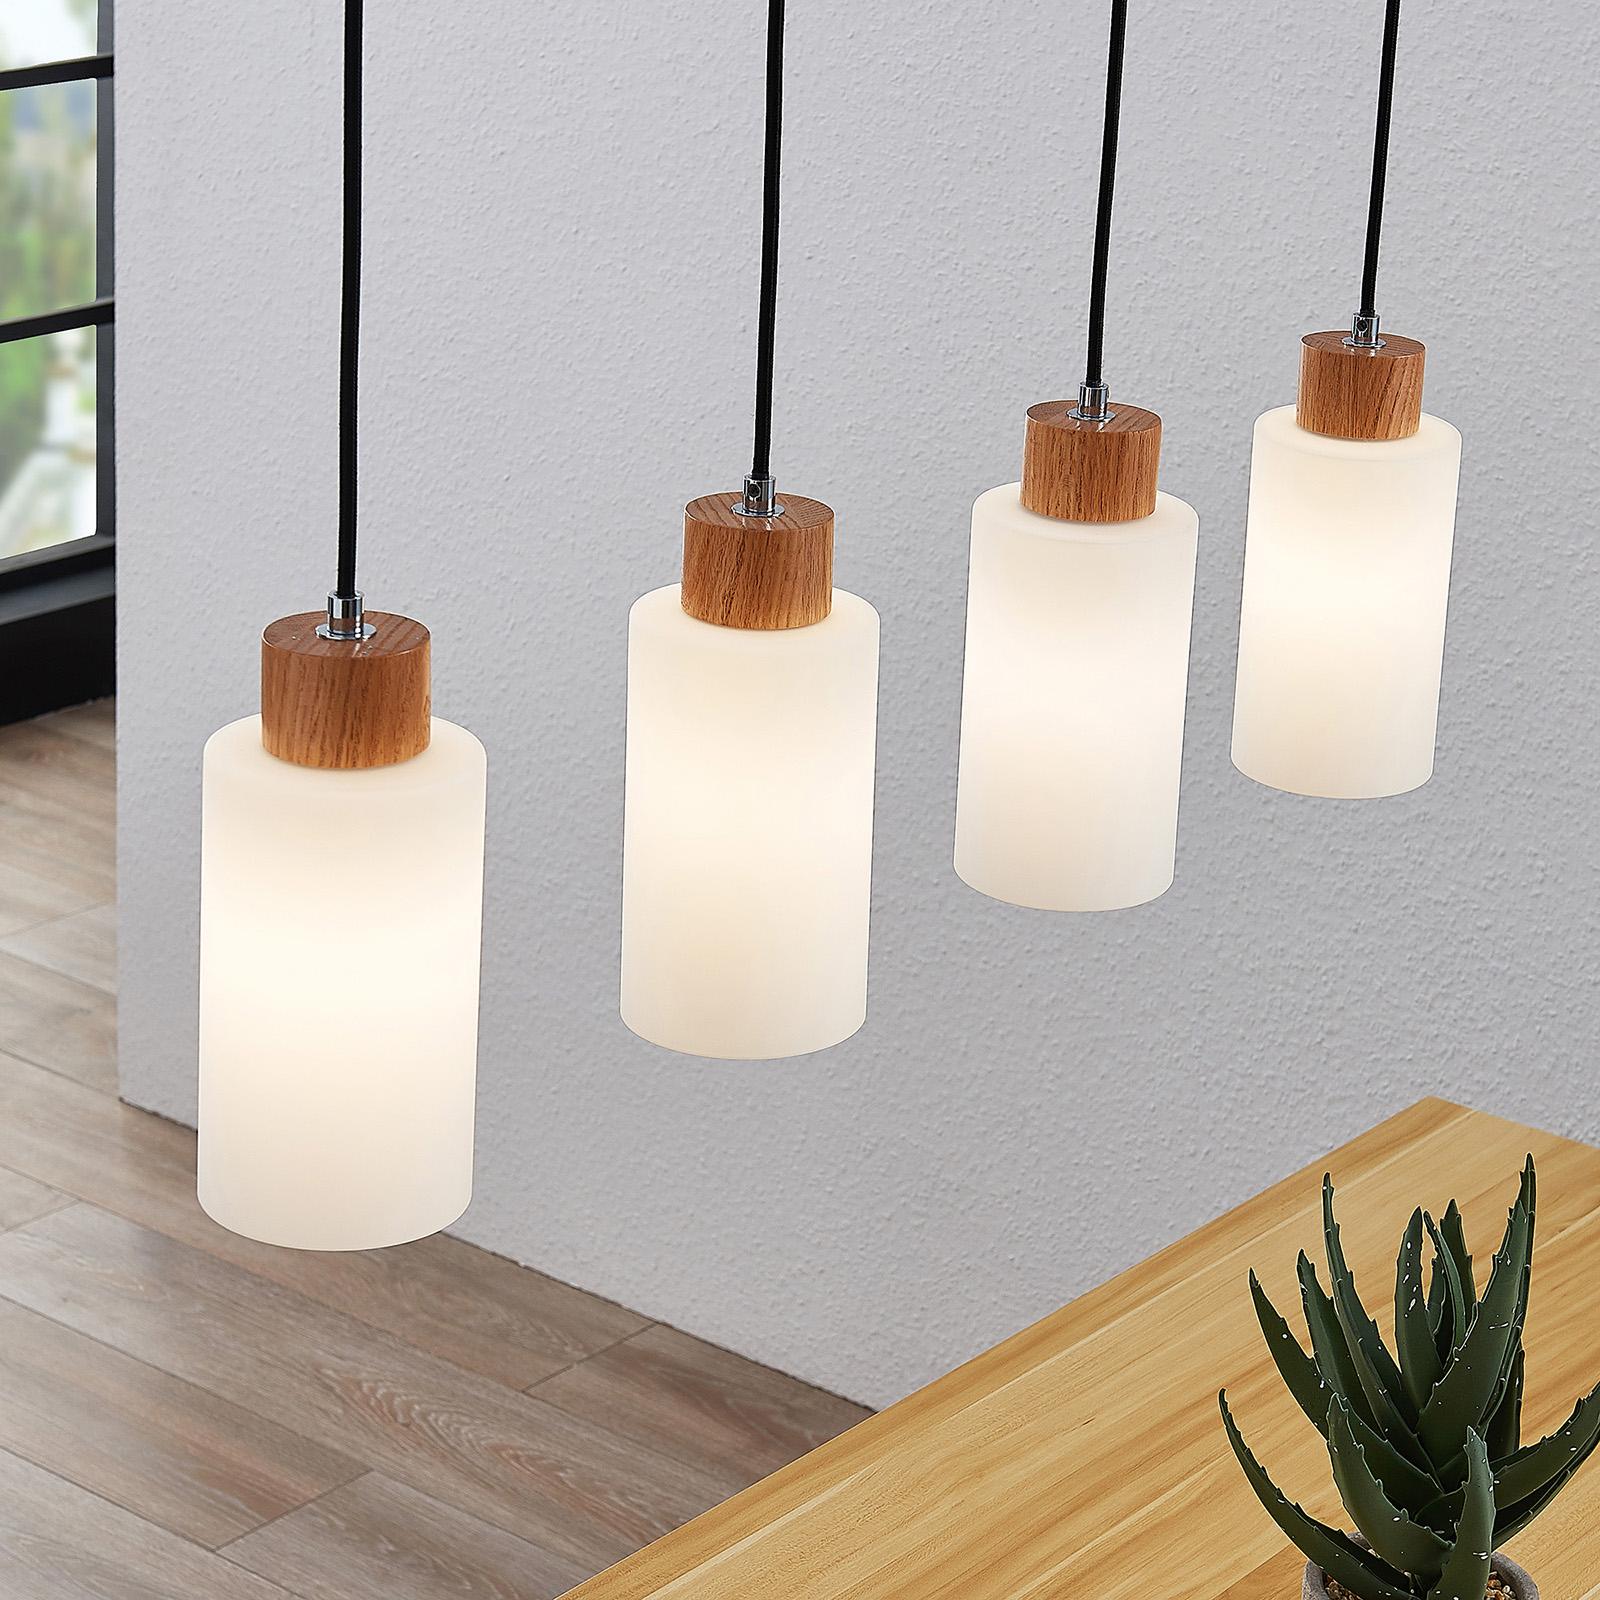 Lindby Nicus lampada a sospensione legno, 4 luci